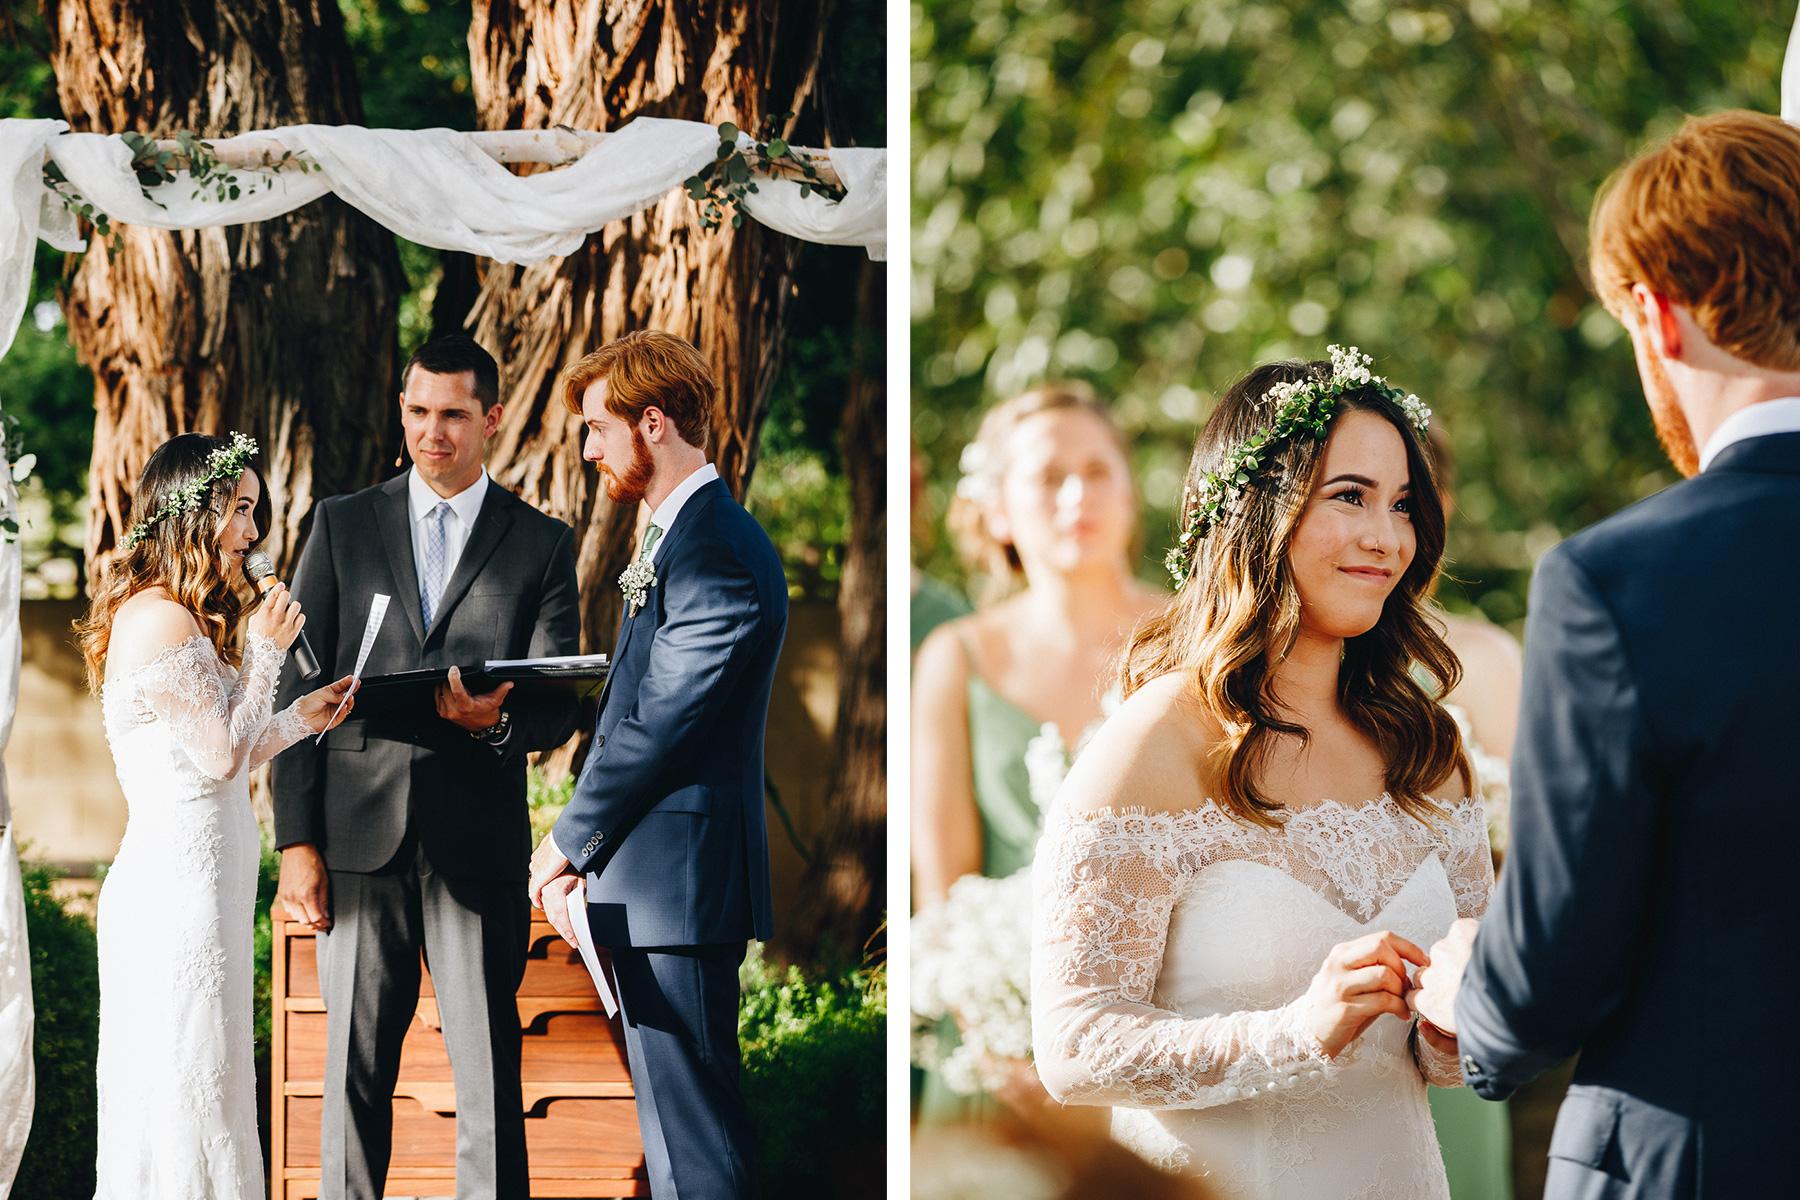 181104-Luxium-Weddings-Arizona-@matt__Le-Brandon-Kariana-Phoenix-Valley-Garden-Center-1068A.jpg